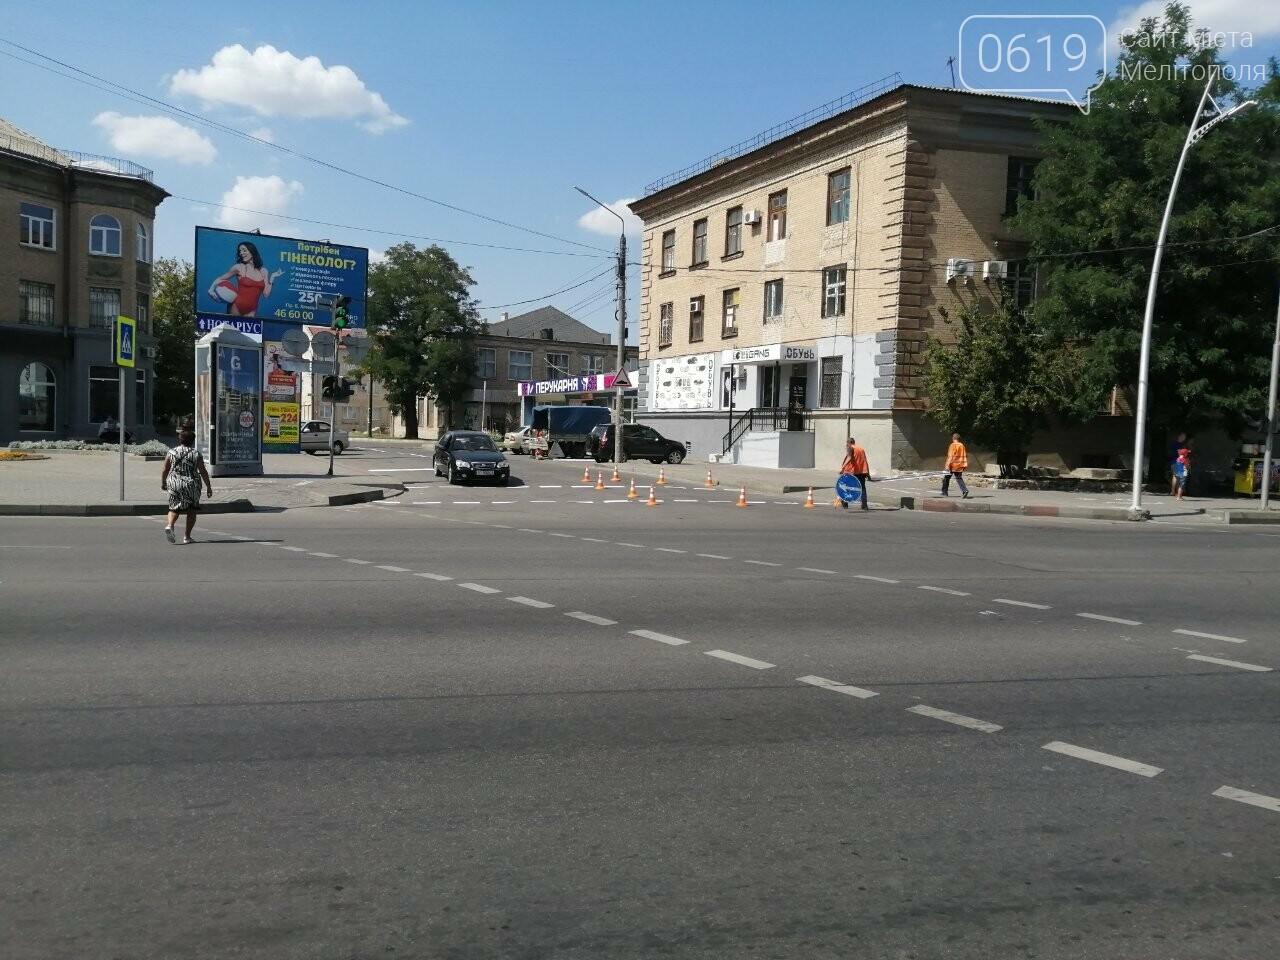 В центре Мелитополя обновили дорожную разметку, фото-1